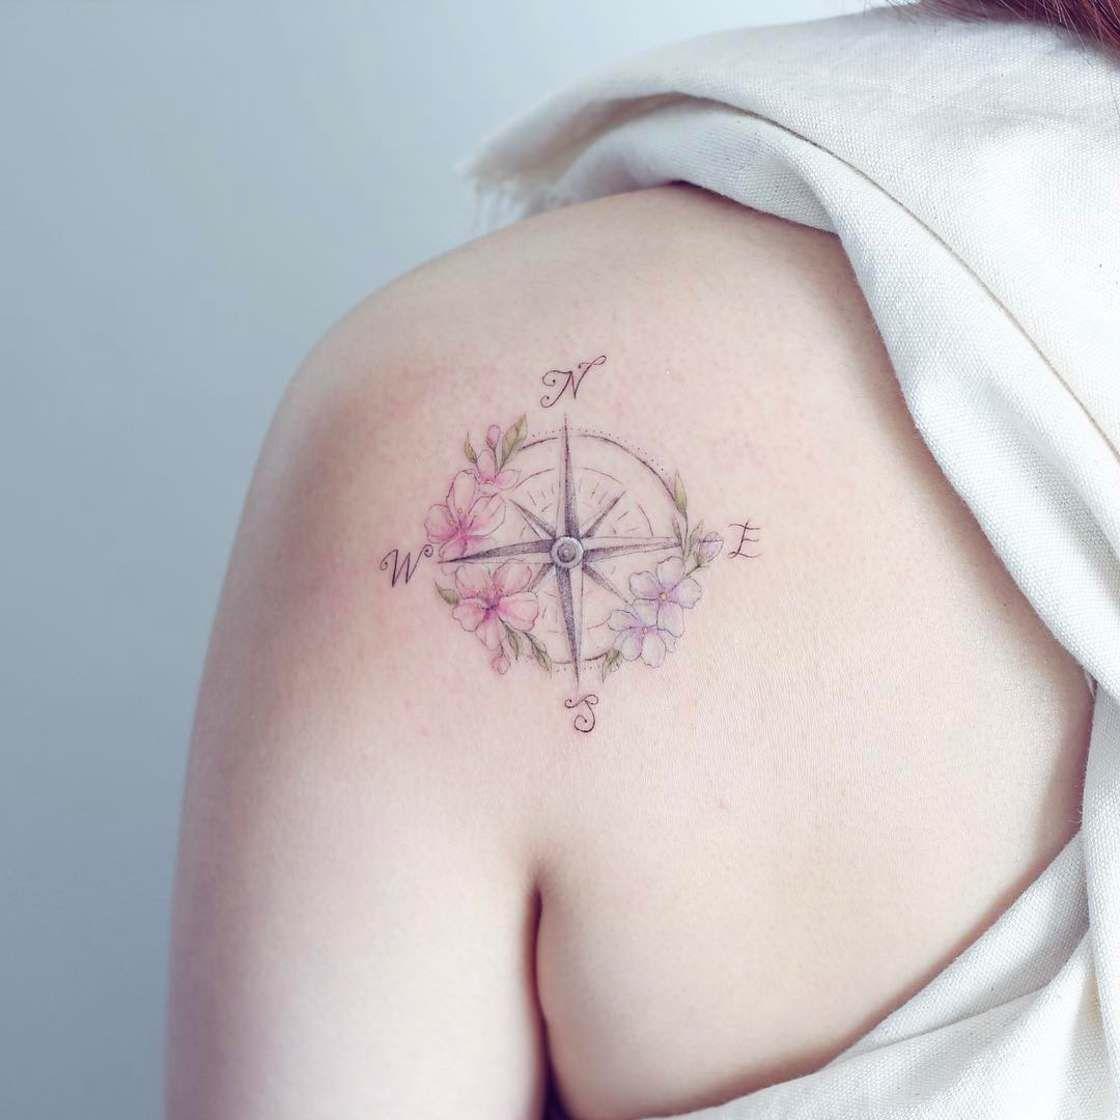 Pastel Tattoos Les Tatouages Poetiques De Mini Lau